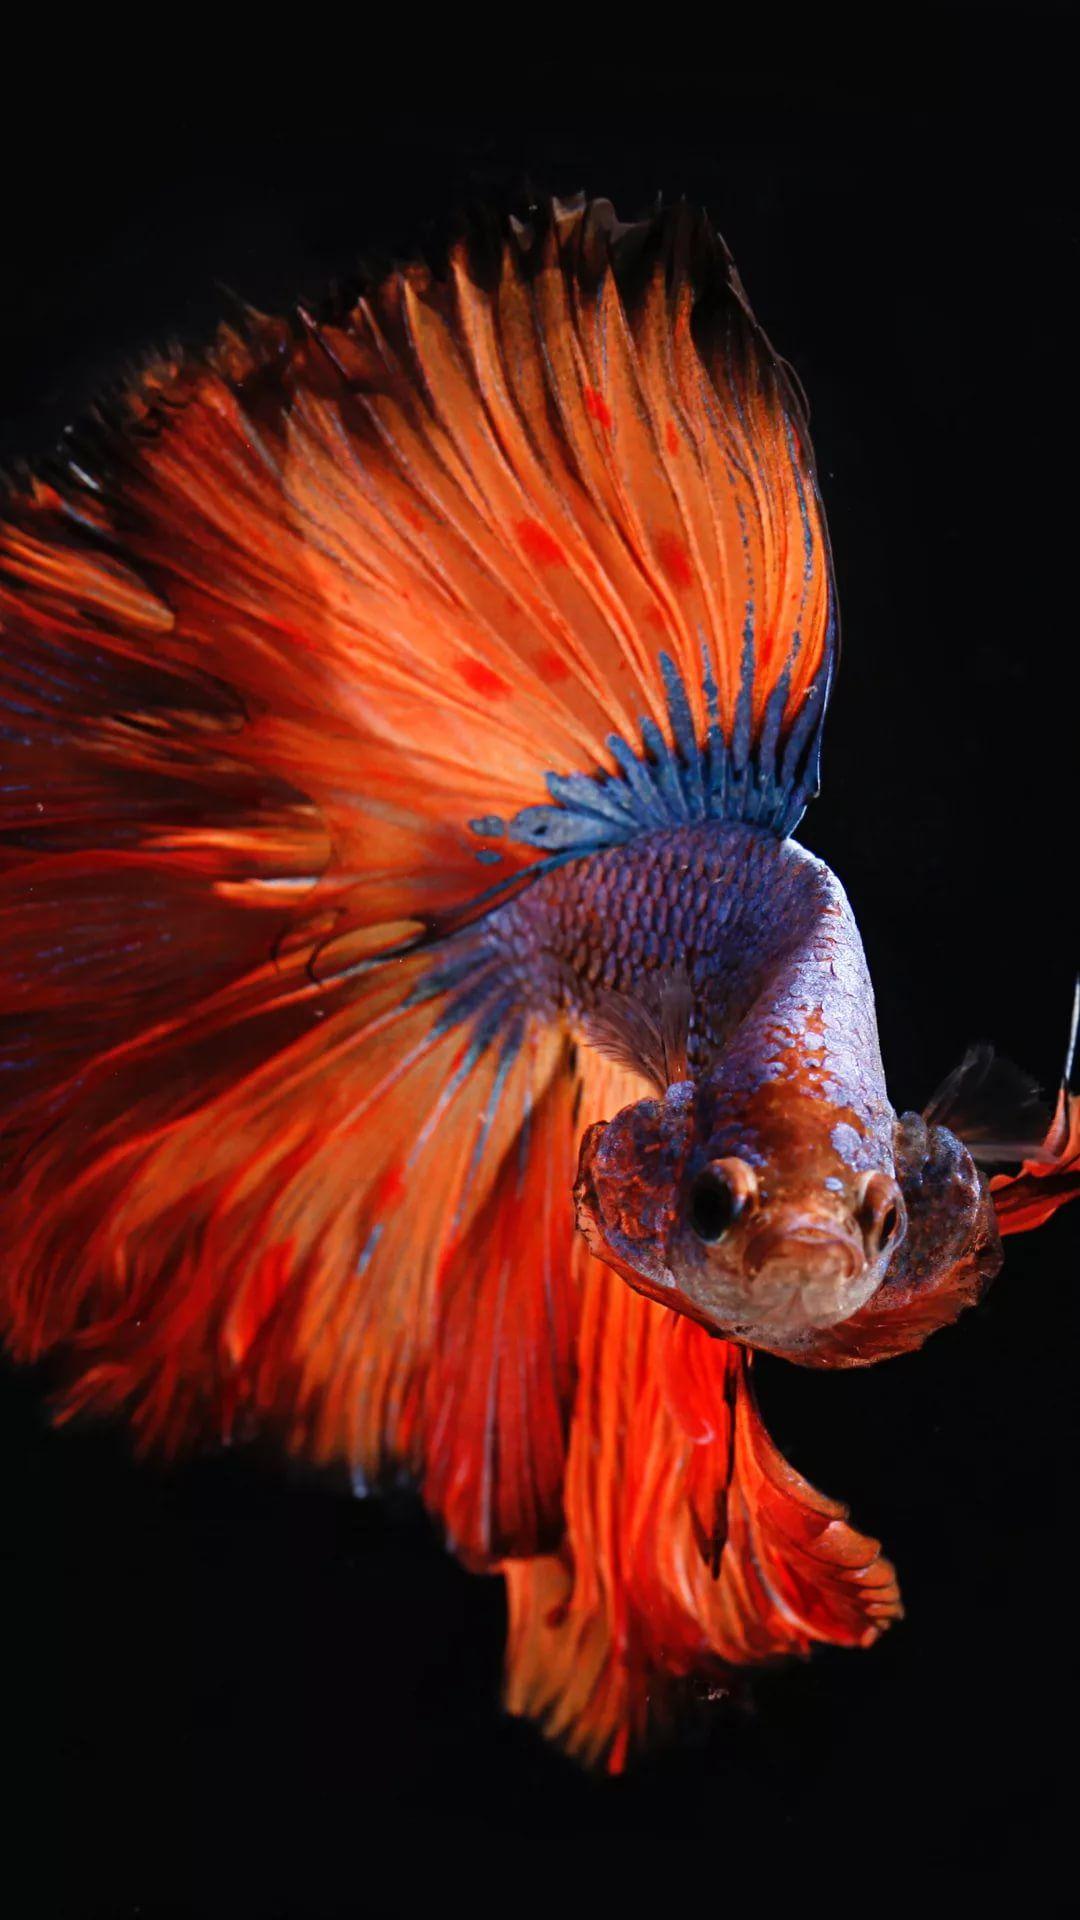 Fish iPhone xs wallpaper download